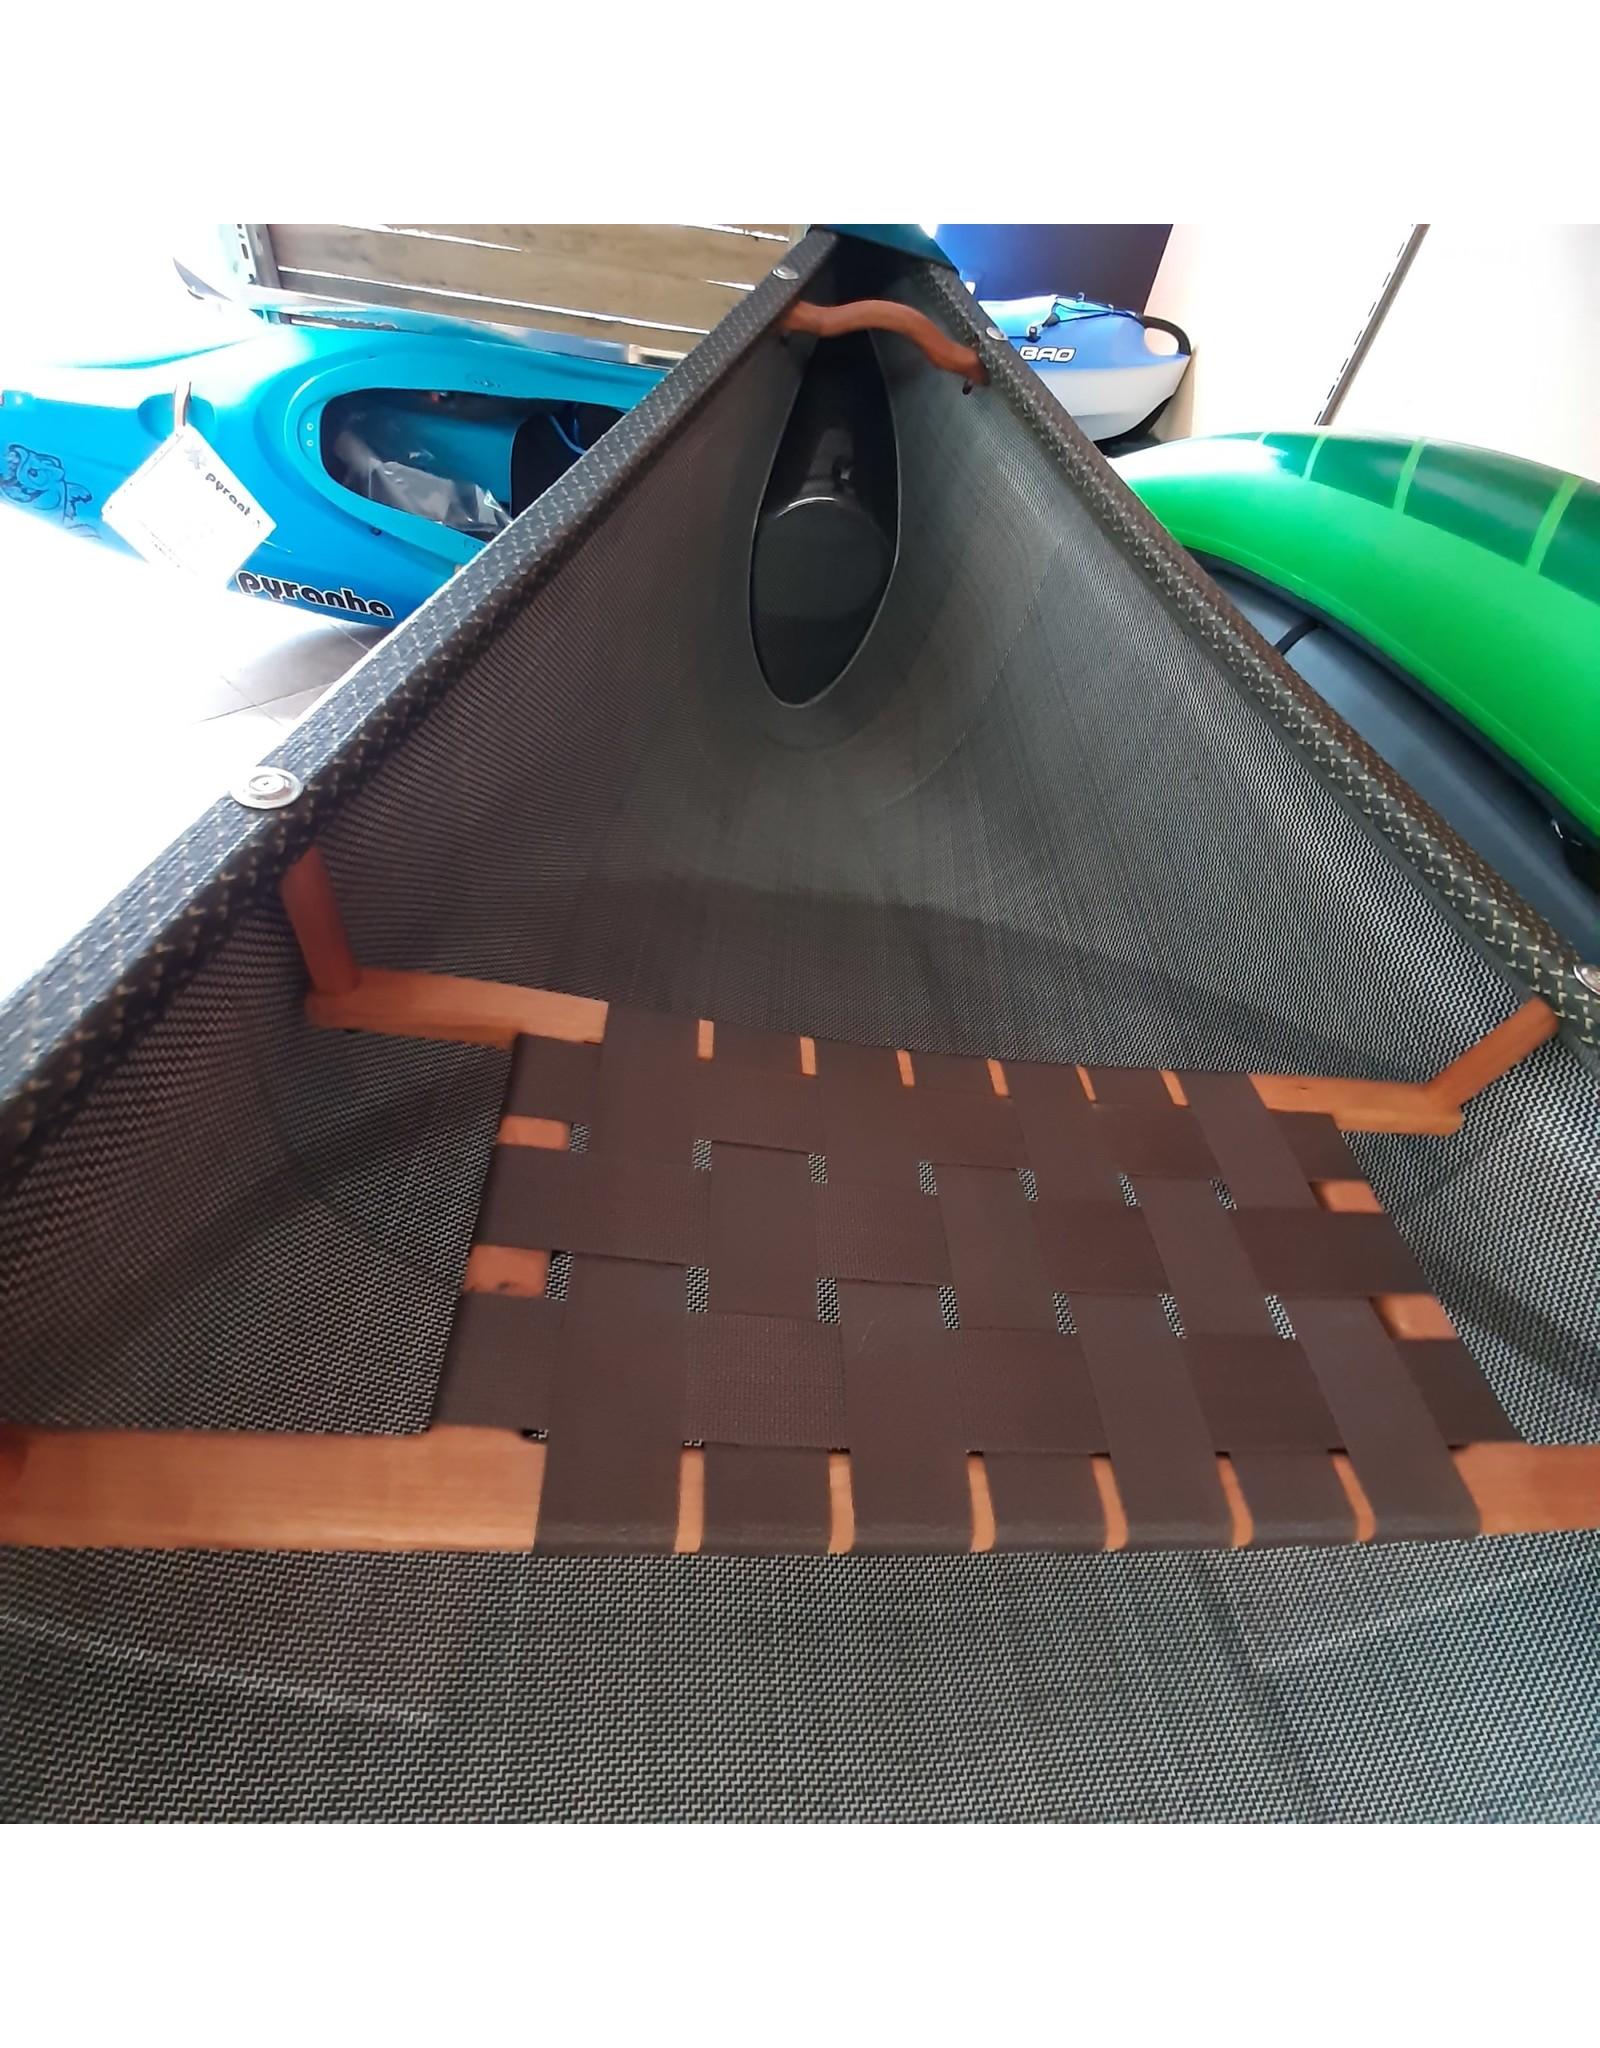 Canots Rhéaume Rhéaume Canot Explorer 16' Carbone (Innegra/Basalt) plats-bords intégrés